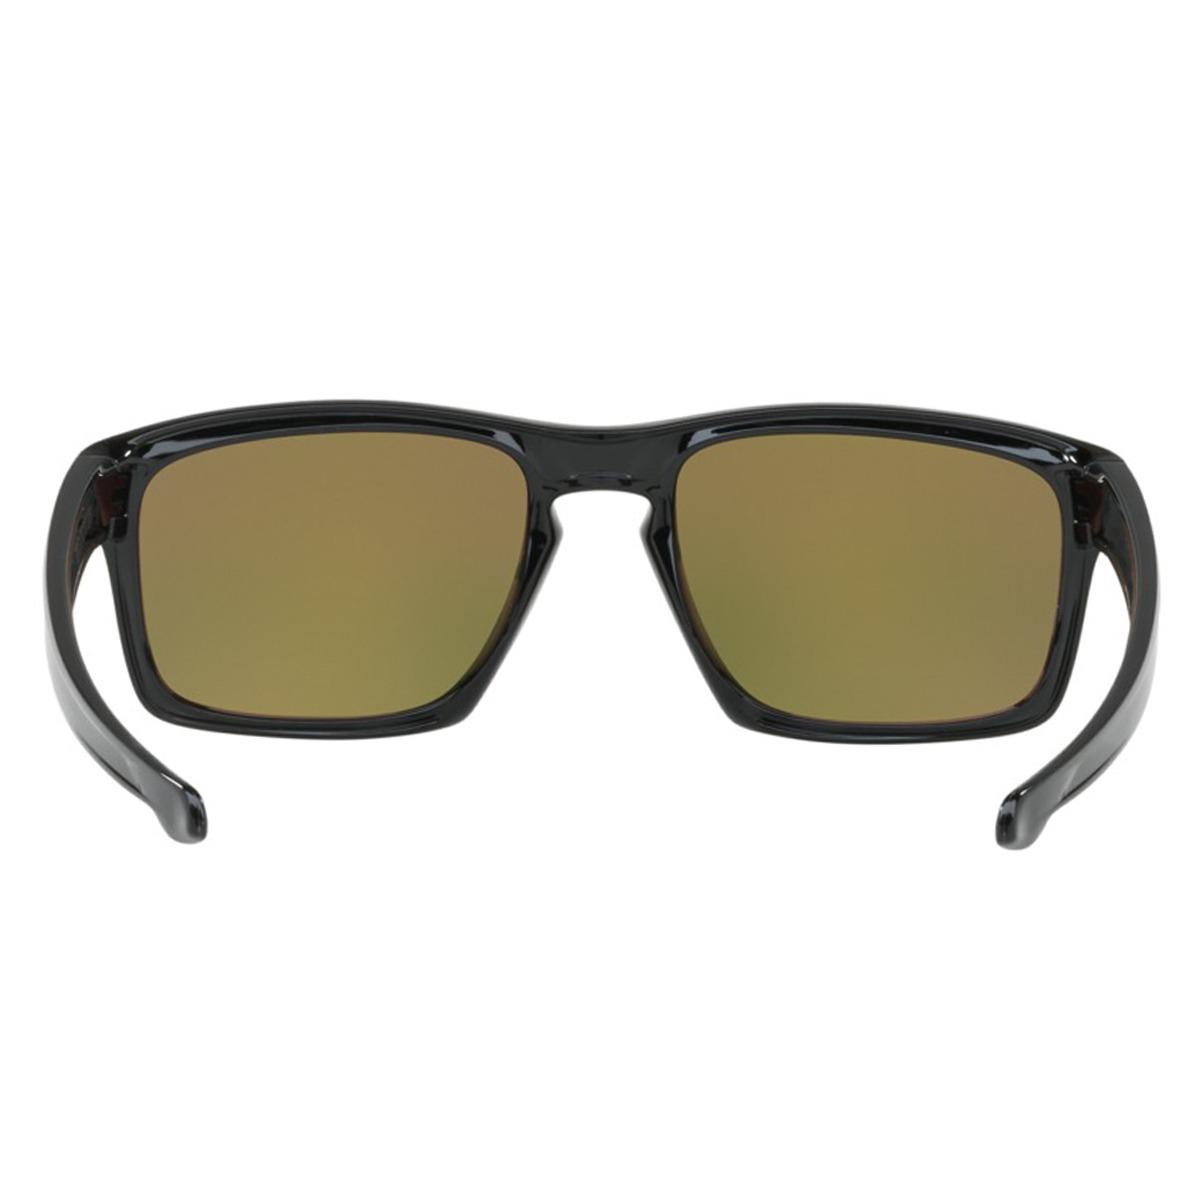 9a8176314d6f2 Óculos Oakley Sliver Polished Black   Lente Fire Iridium Edi - R ...